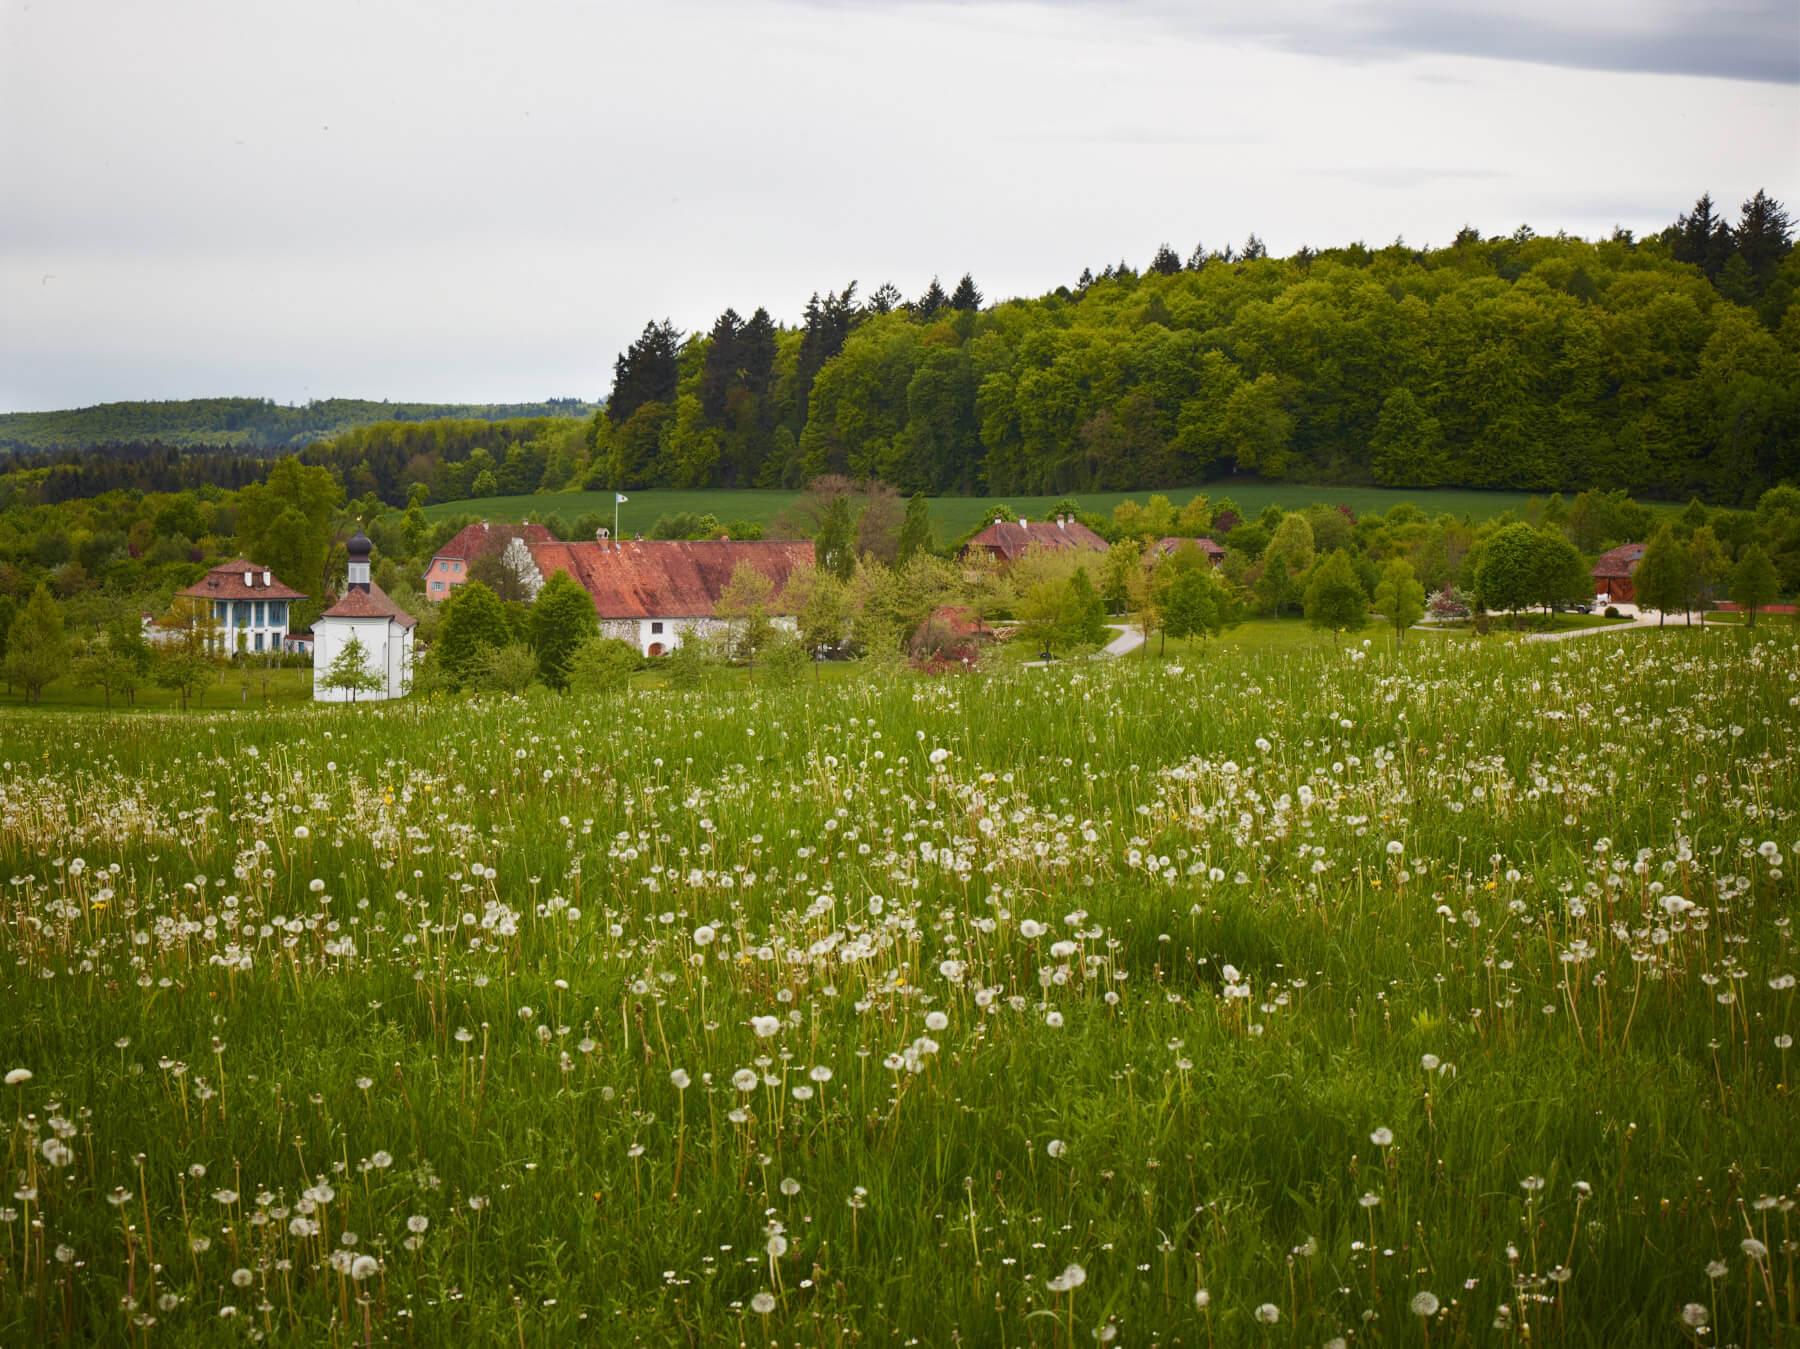 Garden in Eigeltingen, Germany